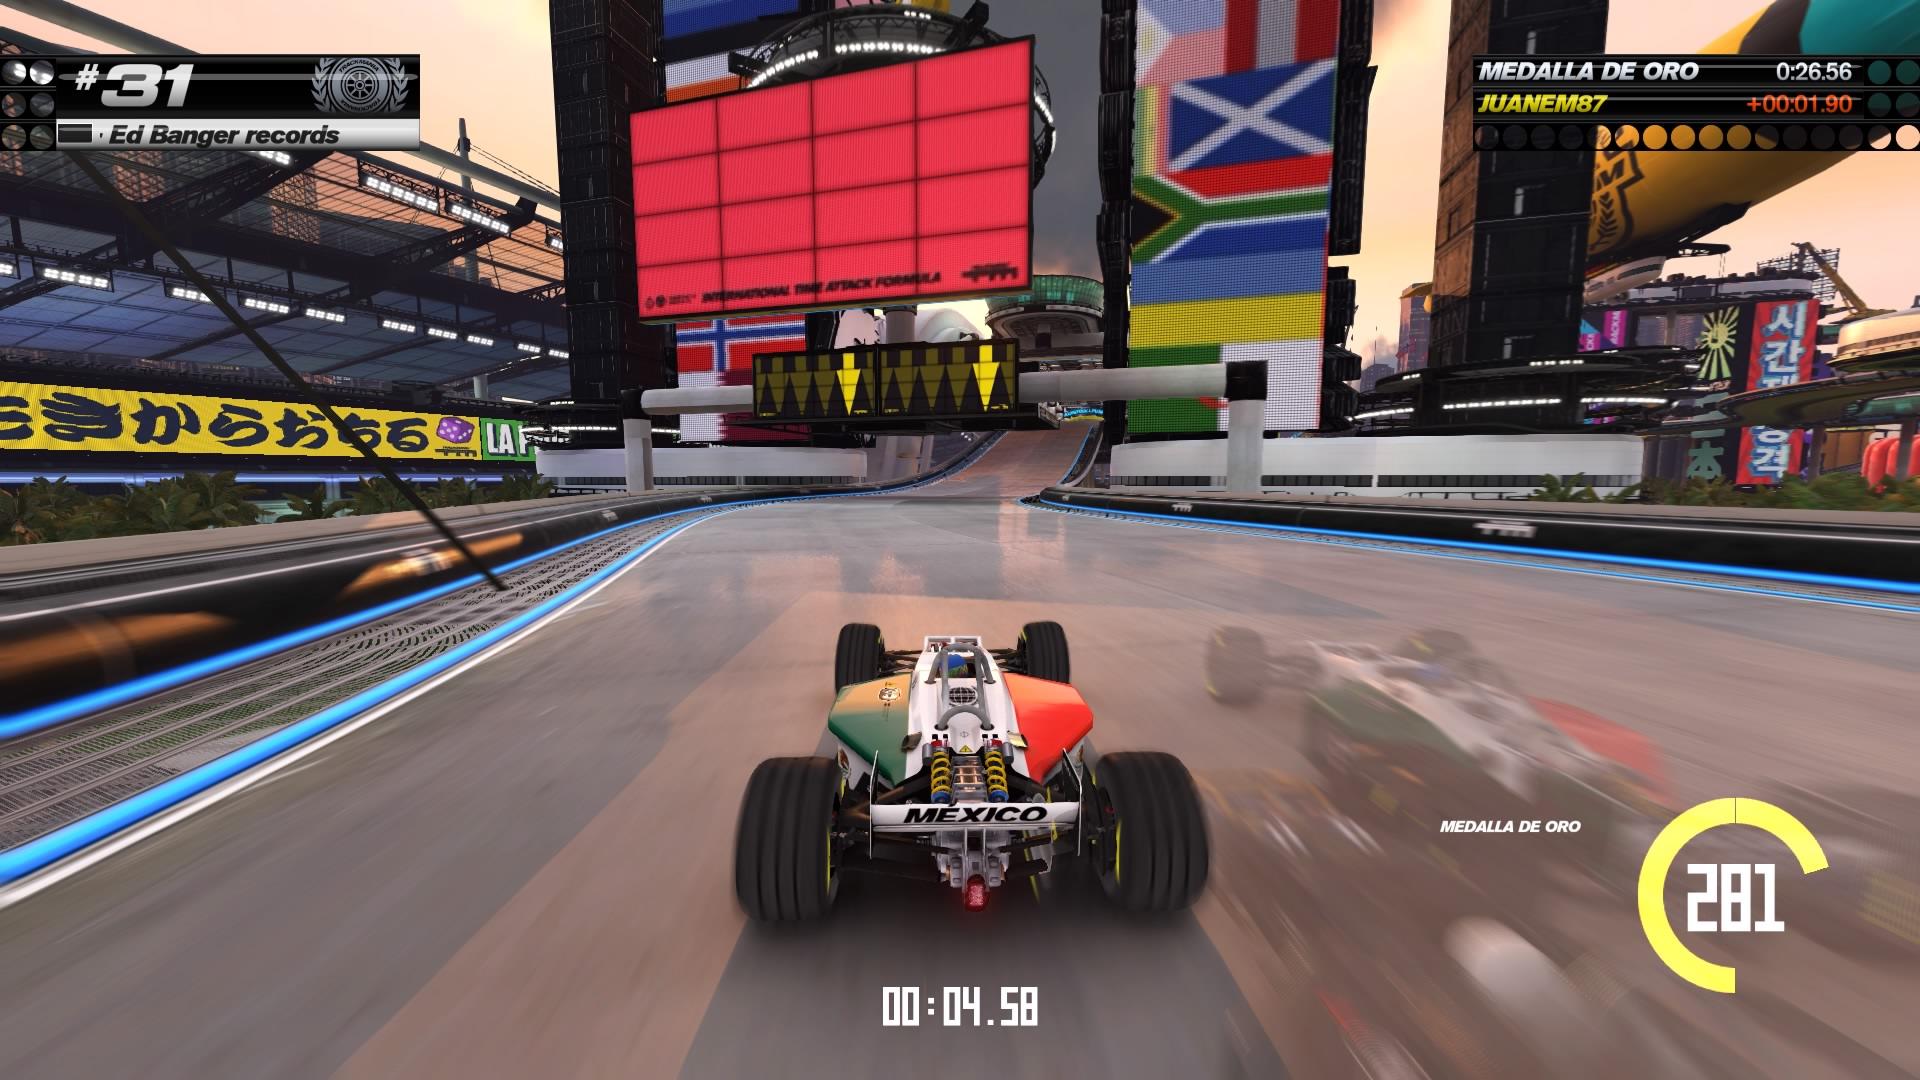 Trackmania Turbo_20160404172259